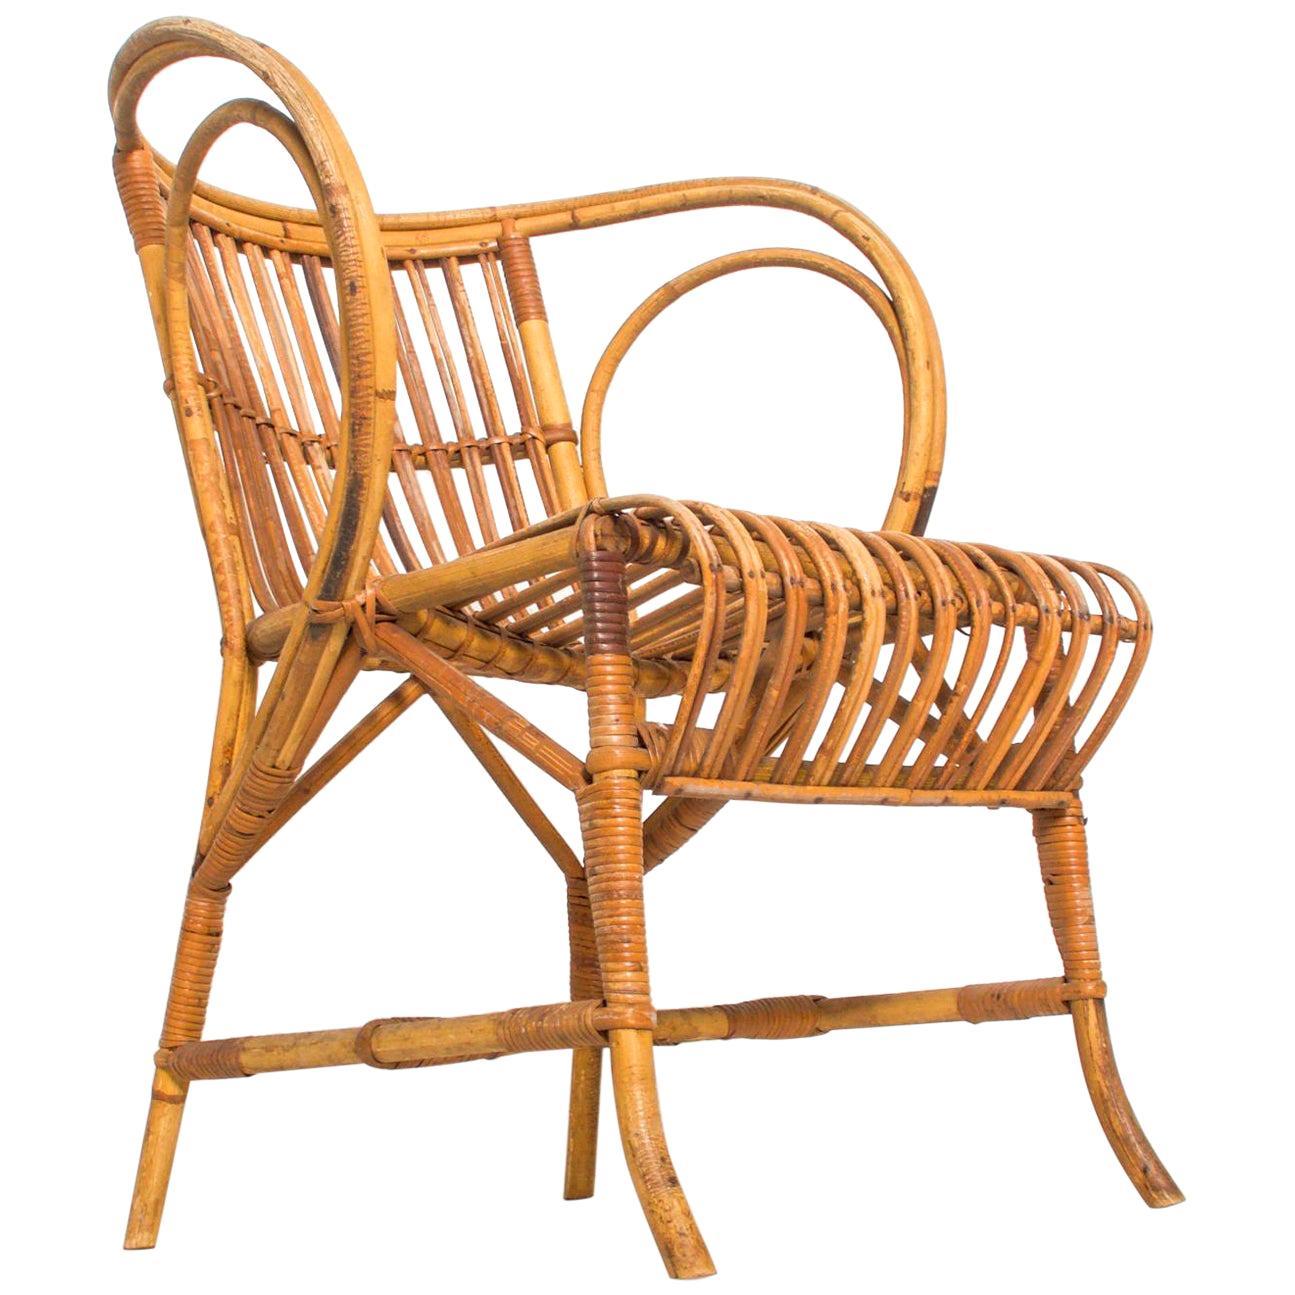 Mid-Century Modern by R. Wengler, Wicker Patio Lounge Chair, Denmark, 1960s